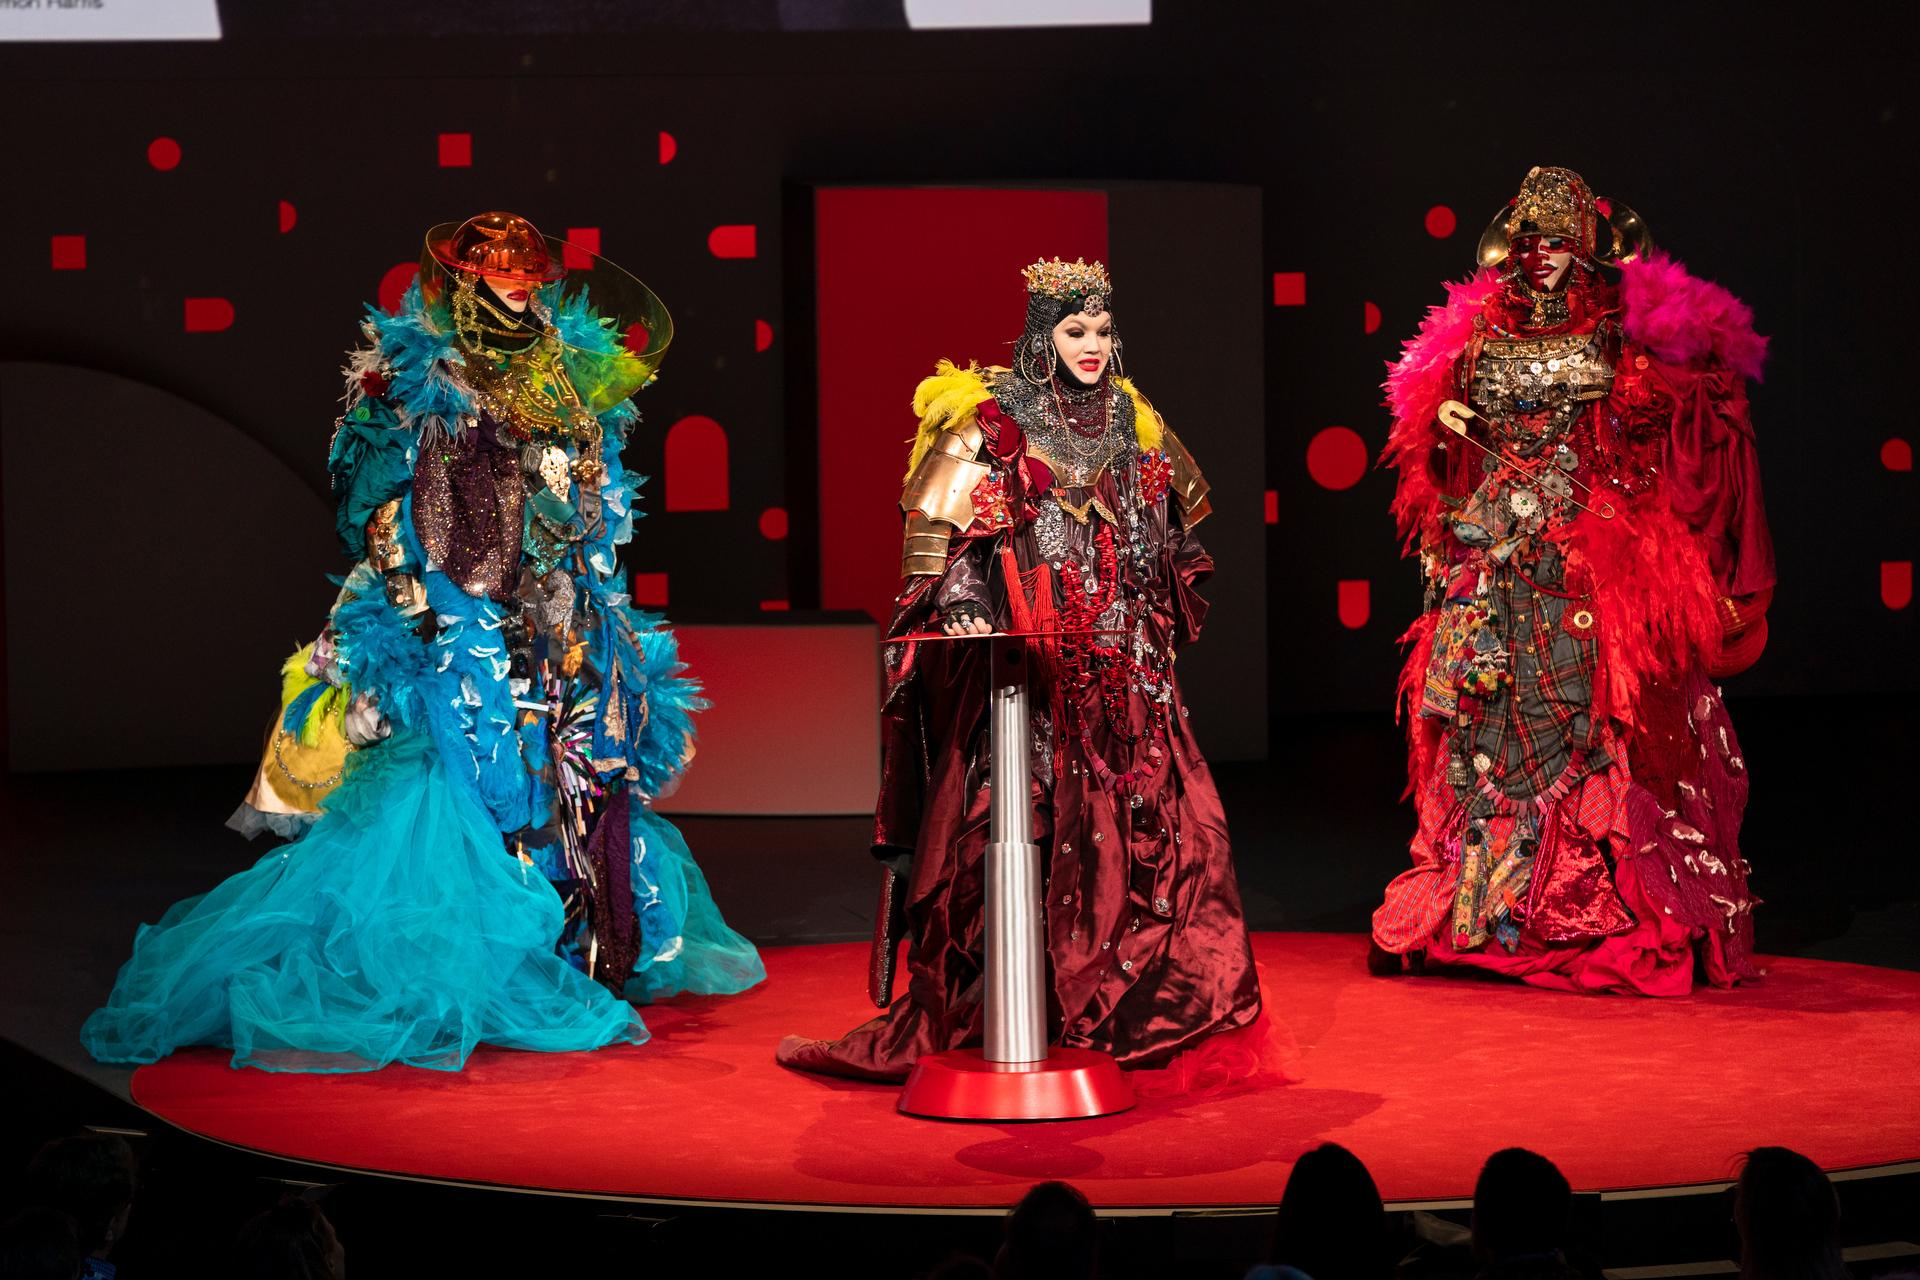 Daniel Lismore speaks at TED2019